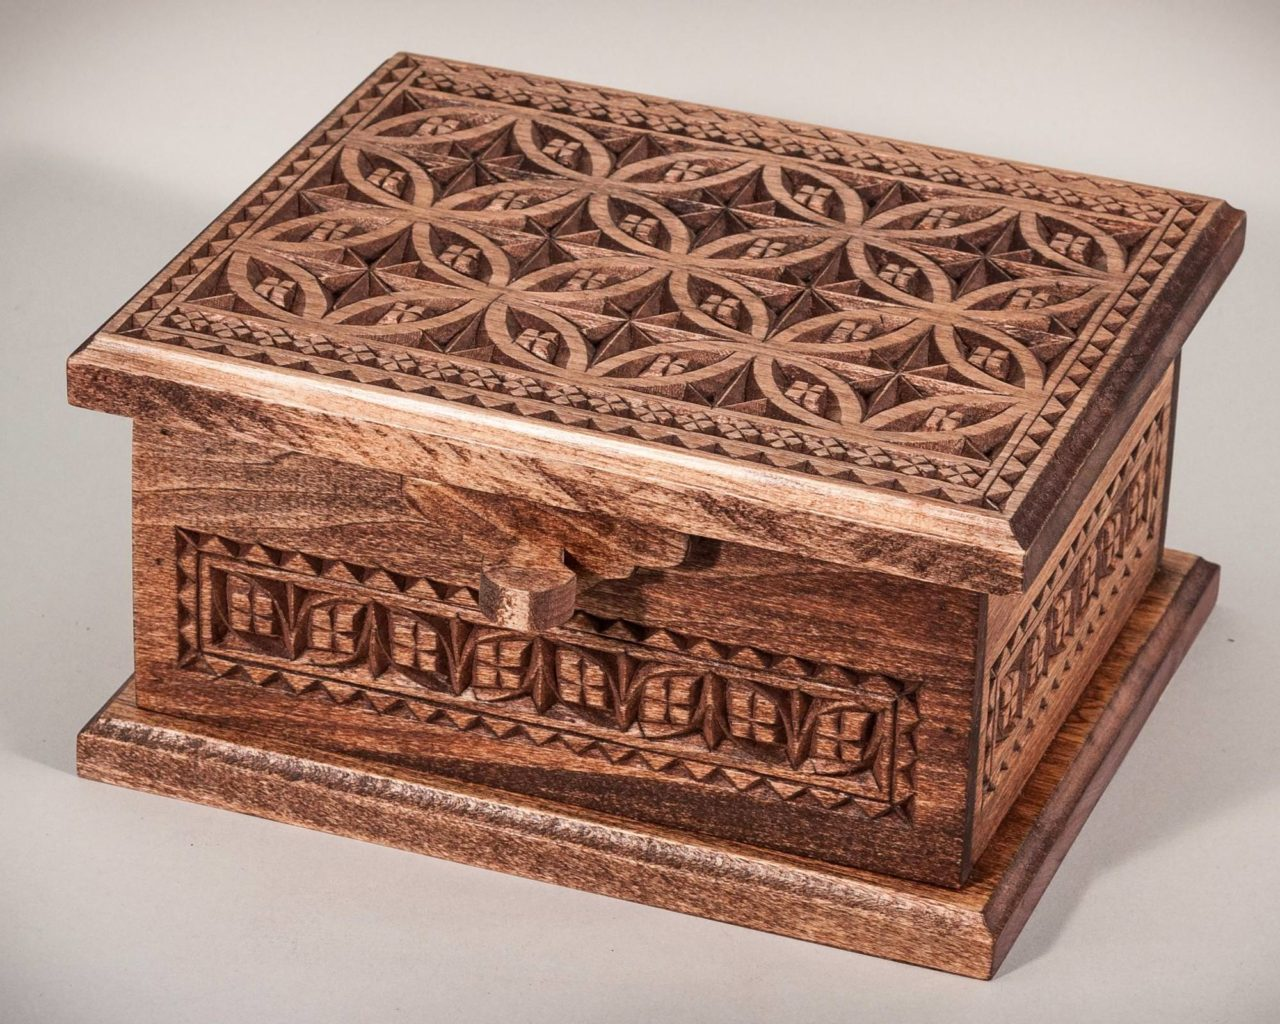 Chip-Carved Box © 2017 Shawn Sersland Chip-Carved Box © 2017 Shawn Sersland